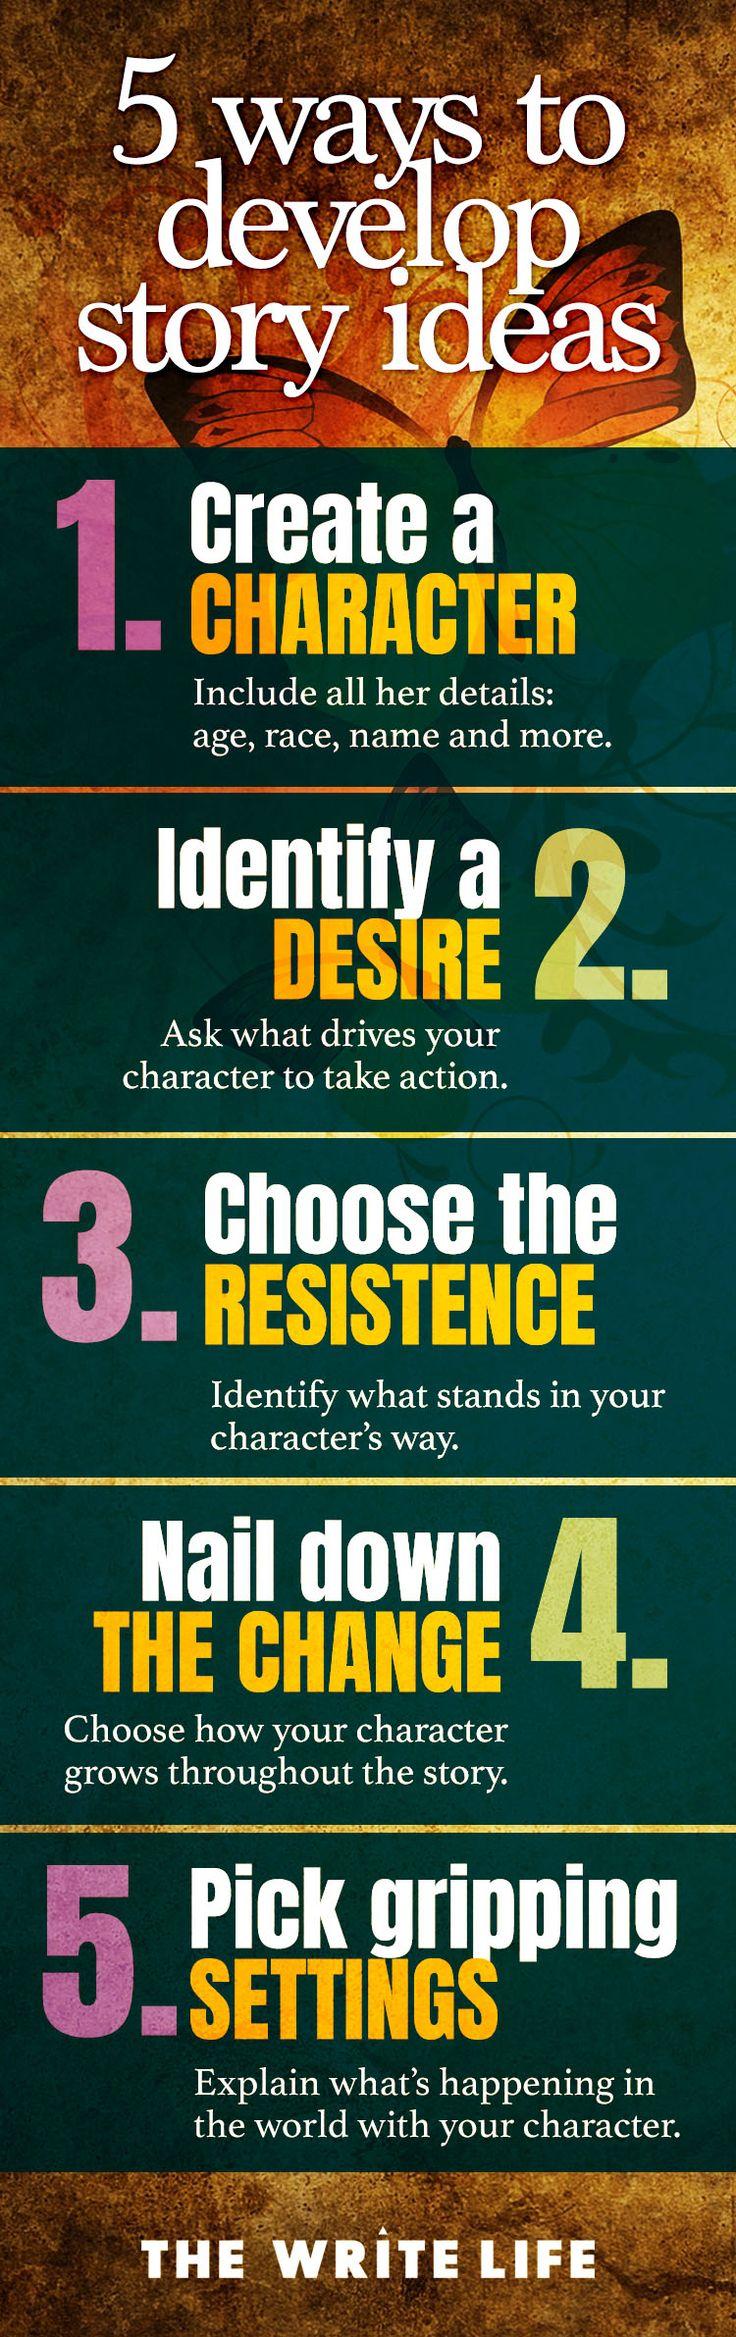 5 ways to develop story ideas. #amwriting #writingtips